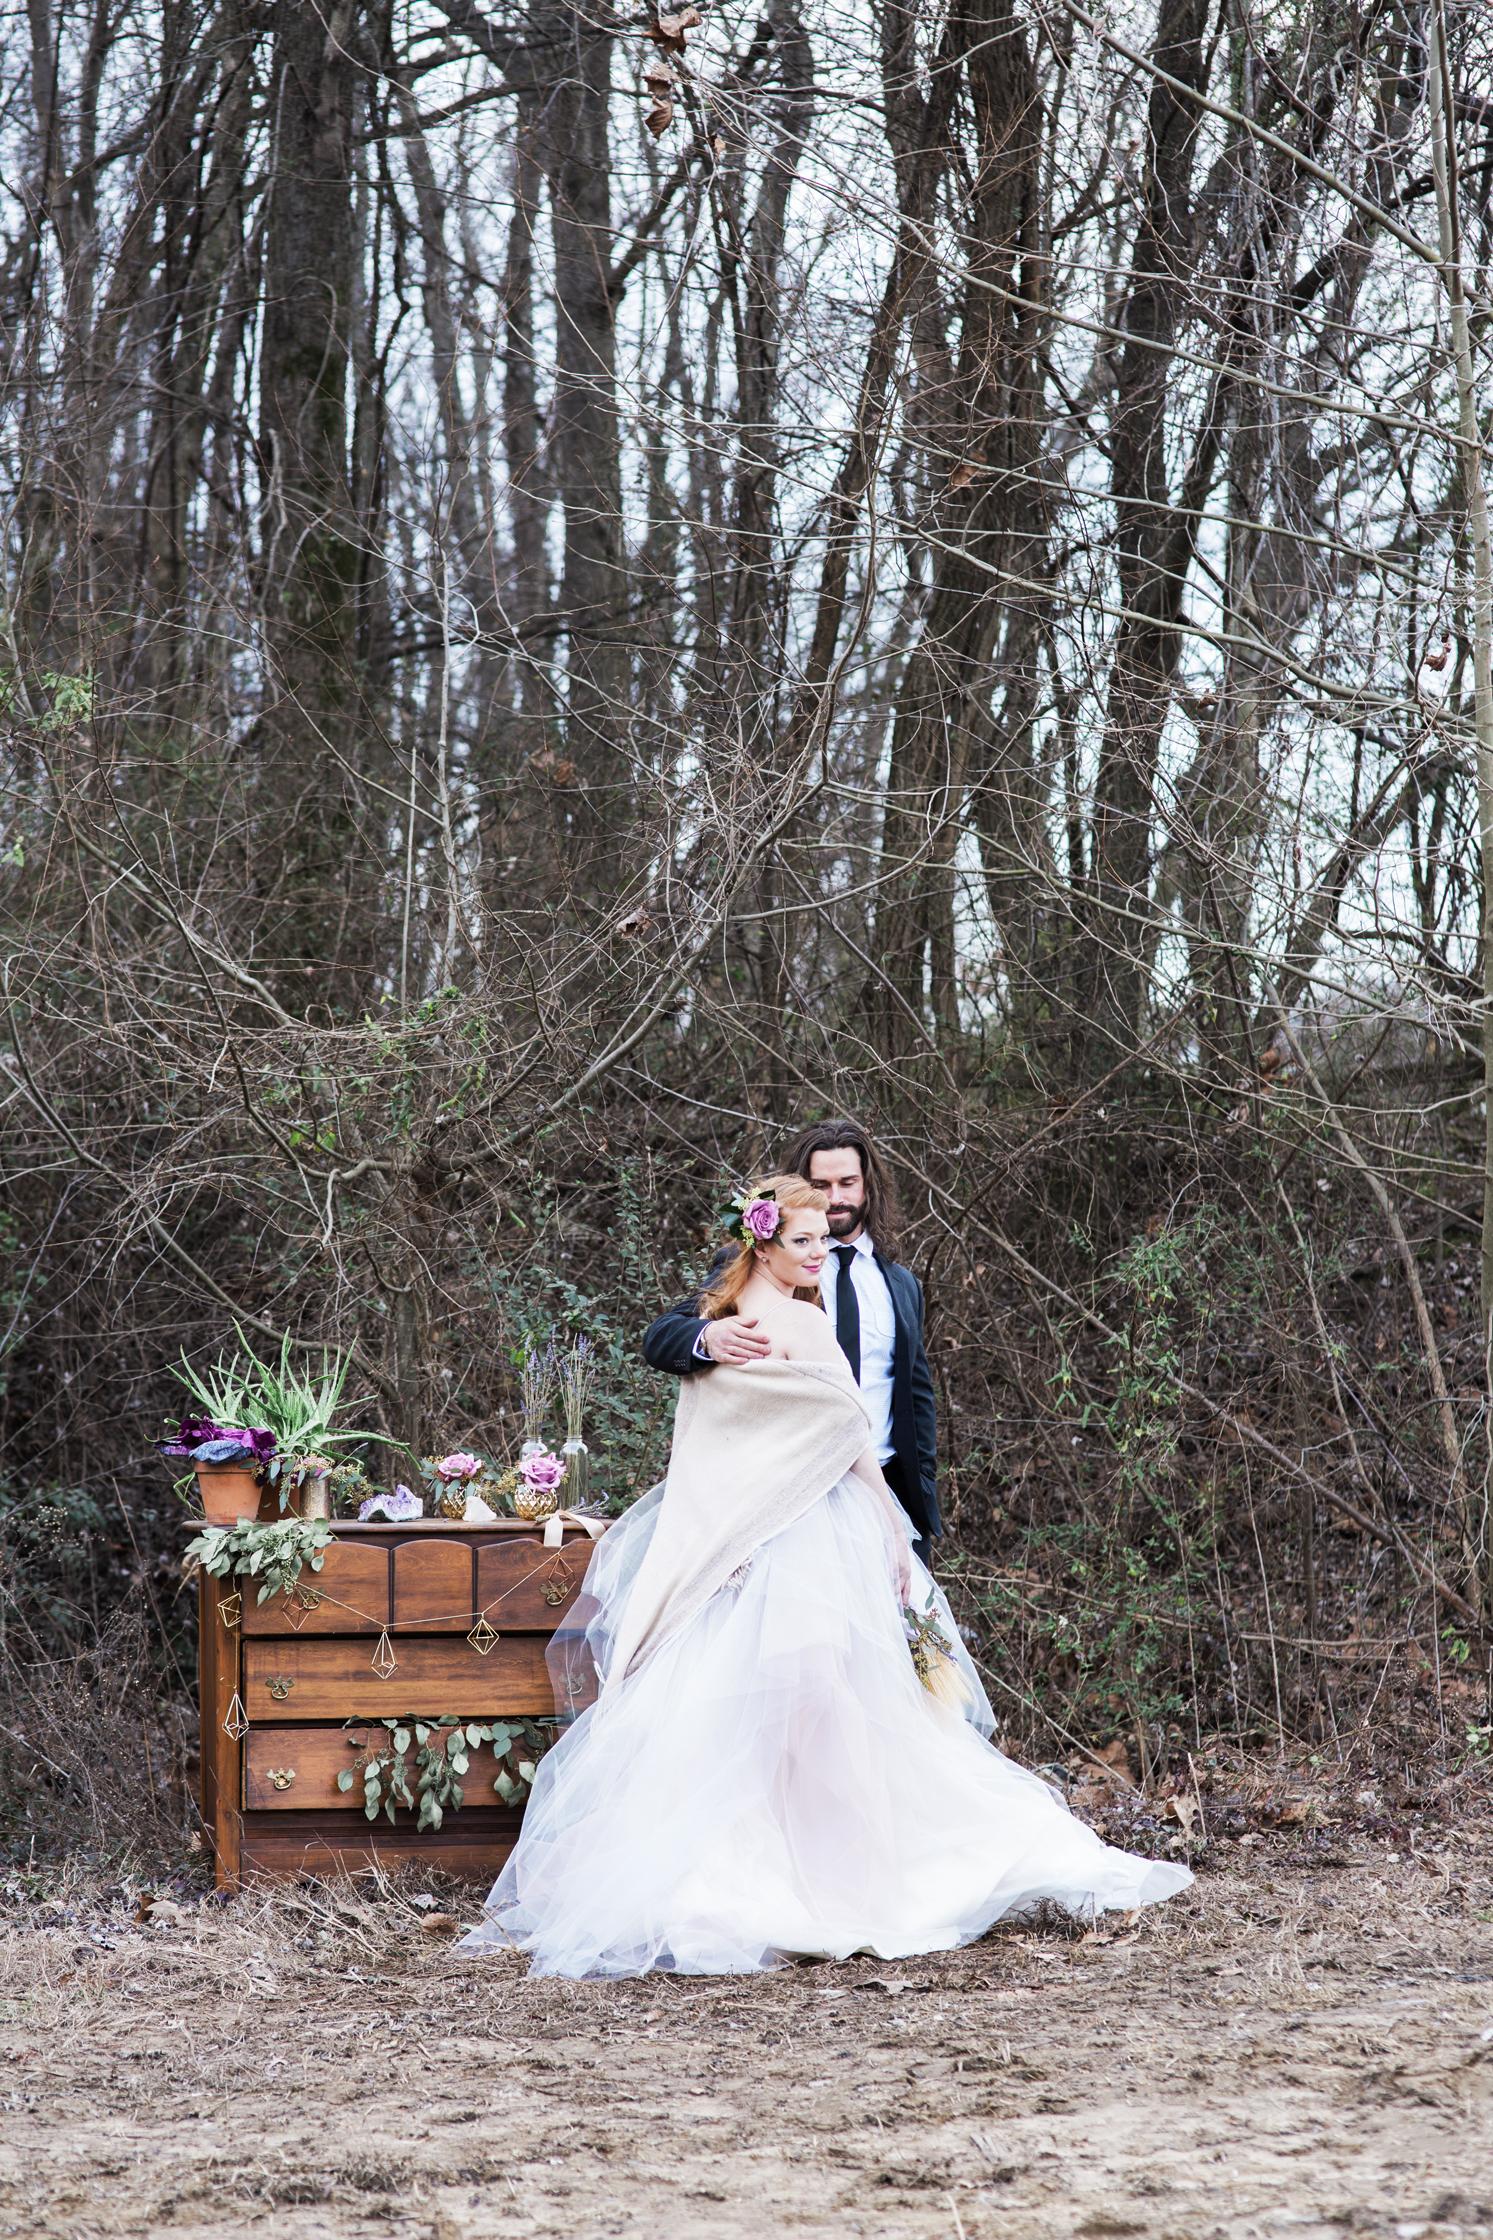 Sara + Matt + Ella _Give Back Bride_Styled Wedding Shoot _K. Stoddard Photography024.jpg